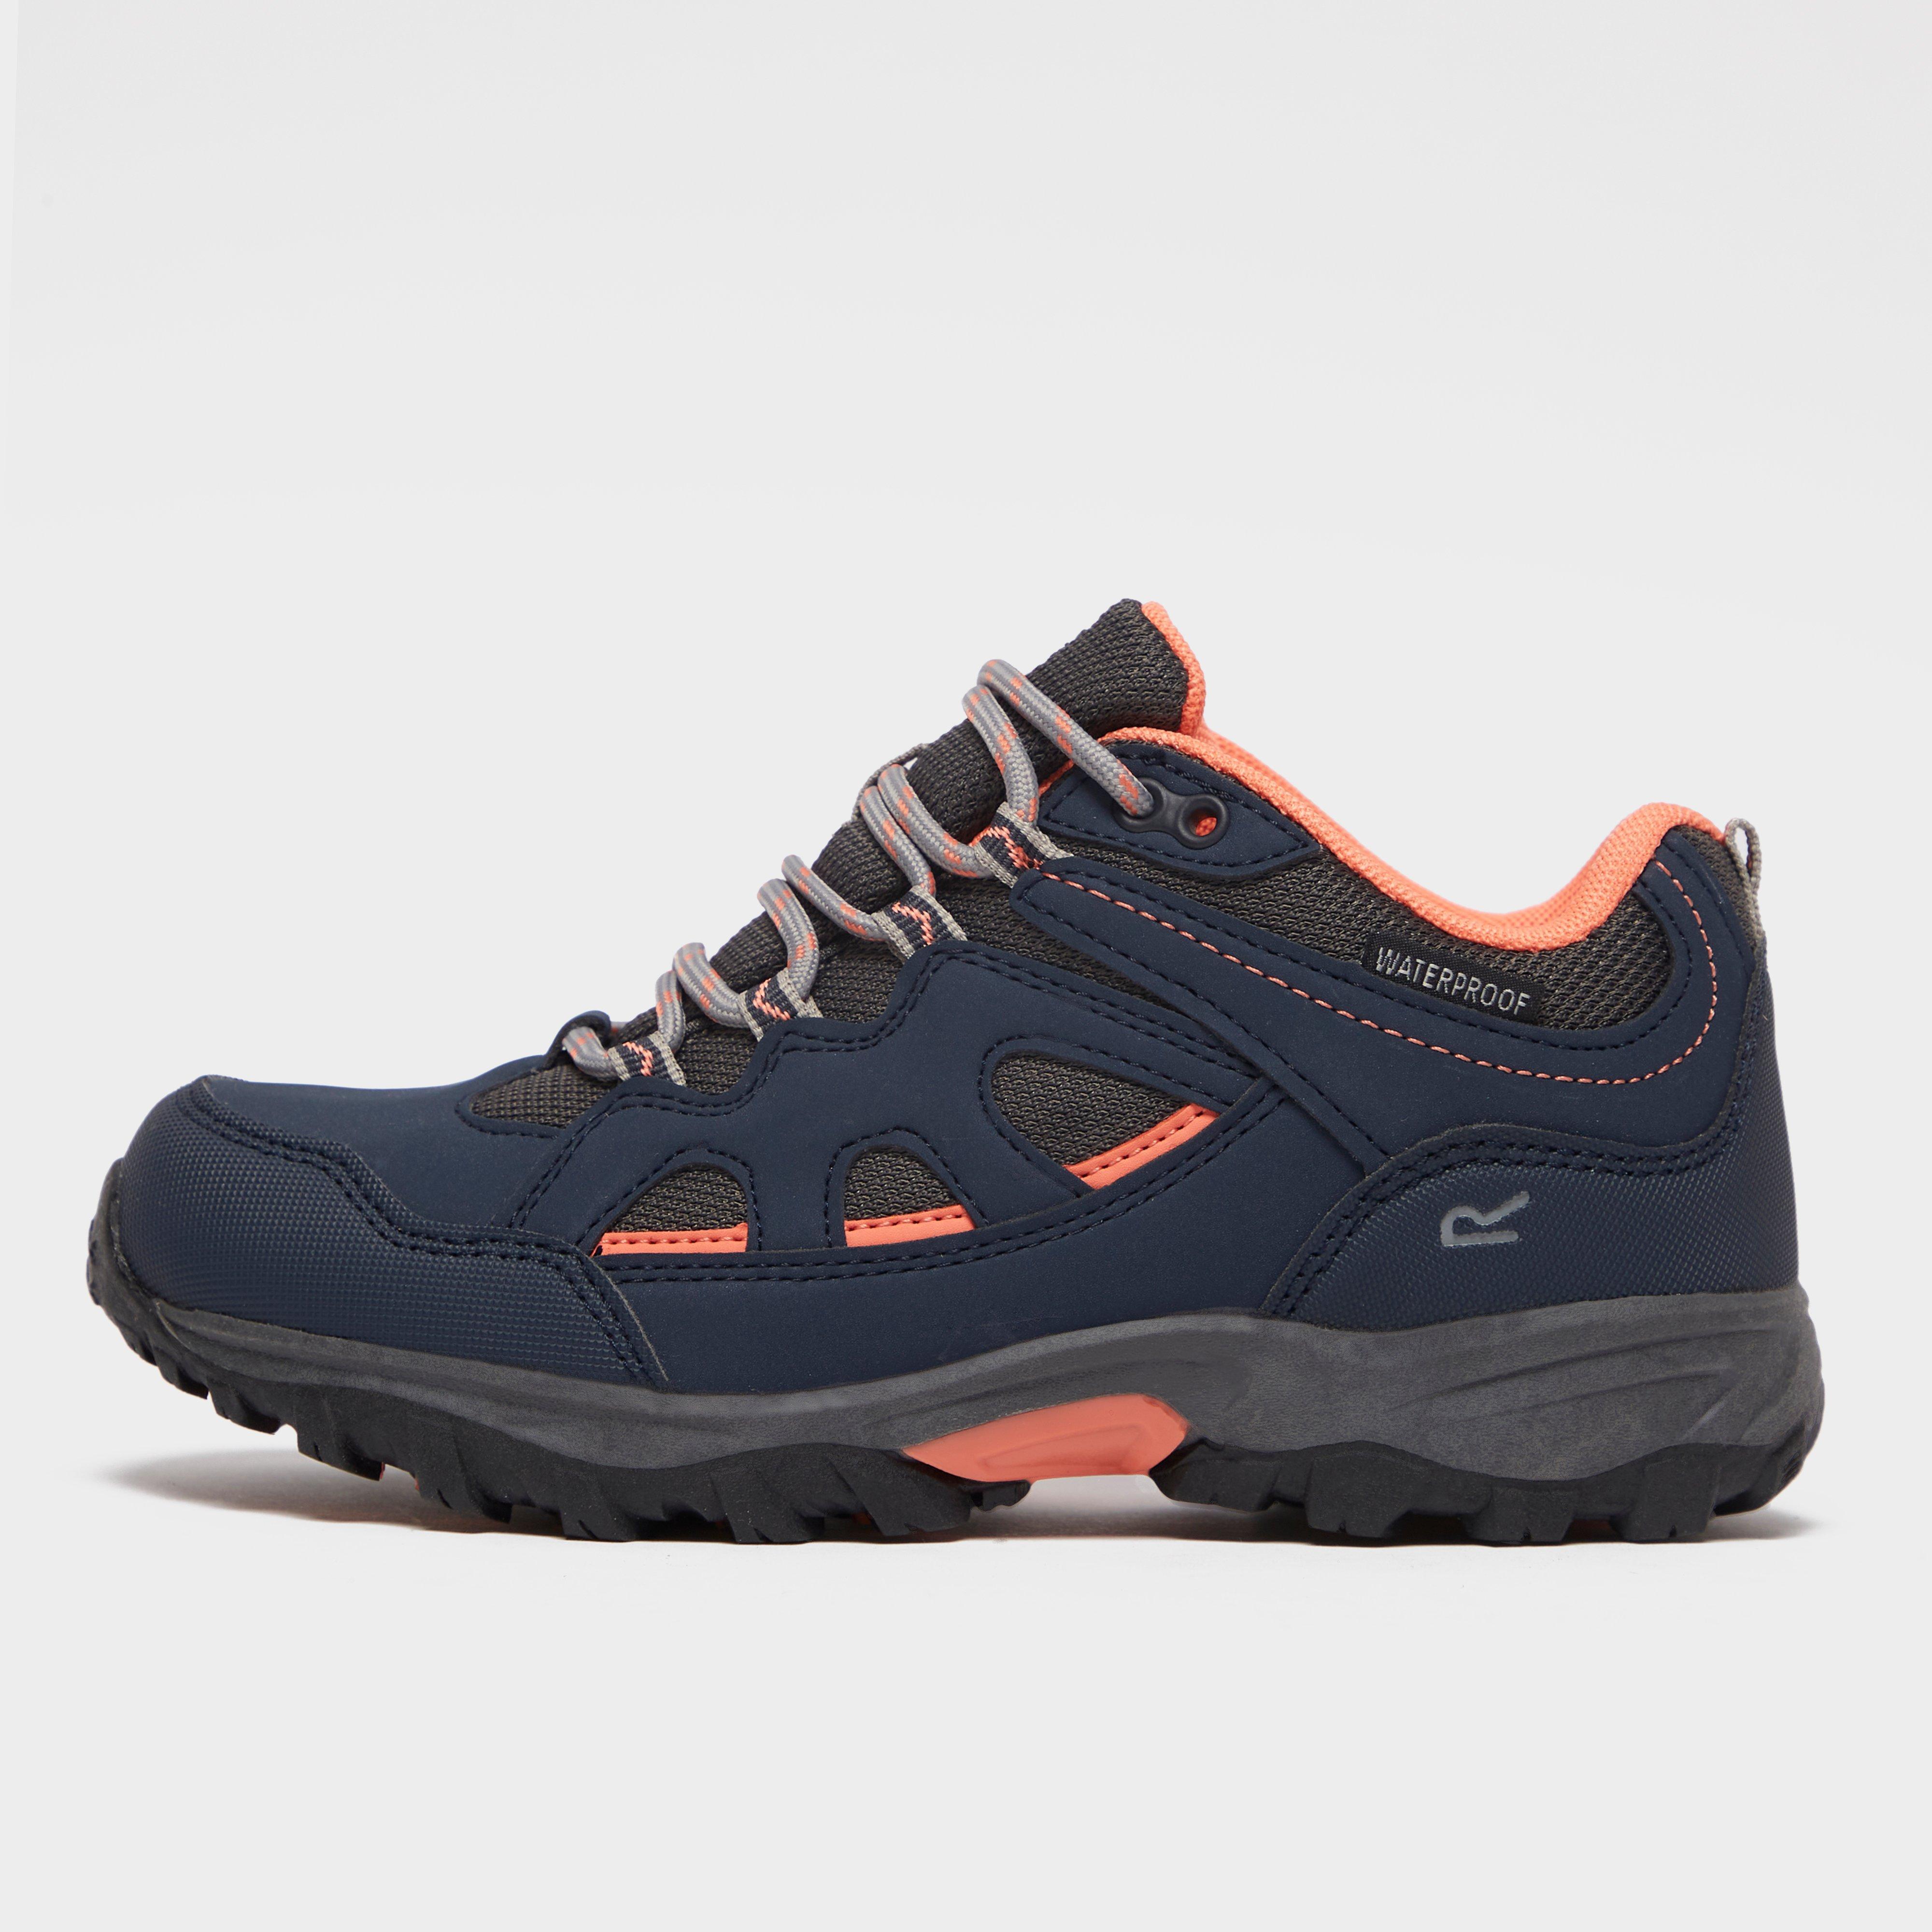 Regatta Kids' Vale Walking Shoes - Navy/Orange, Navy/Orange